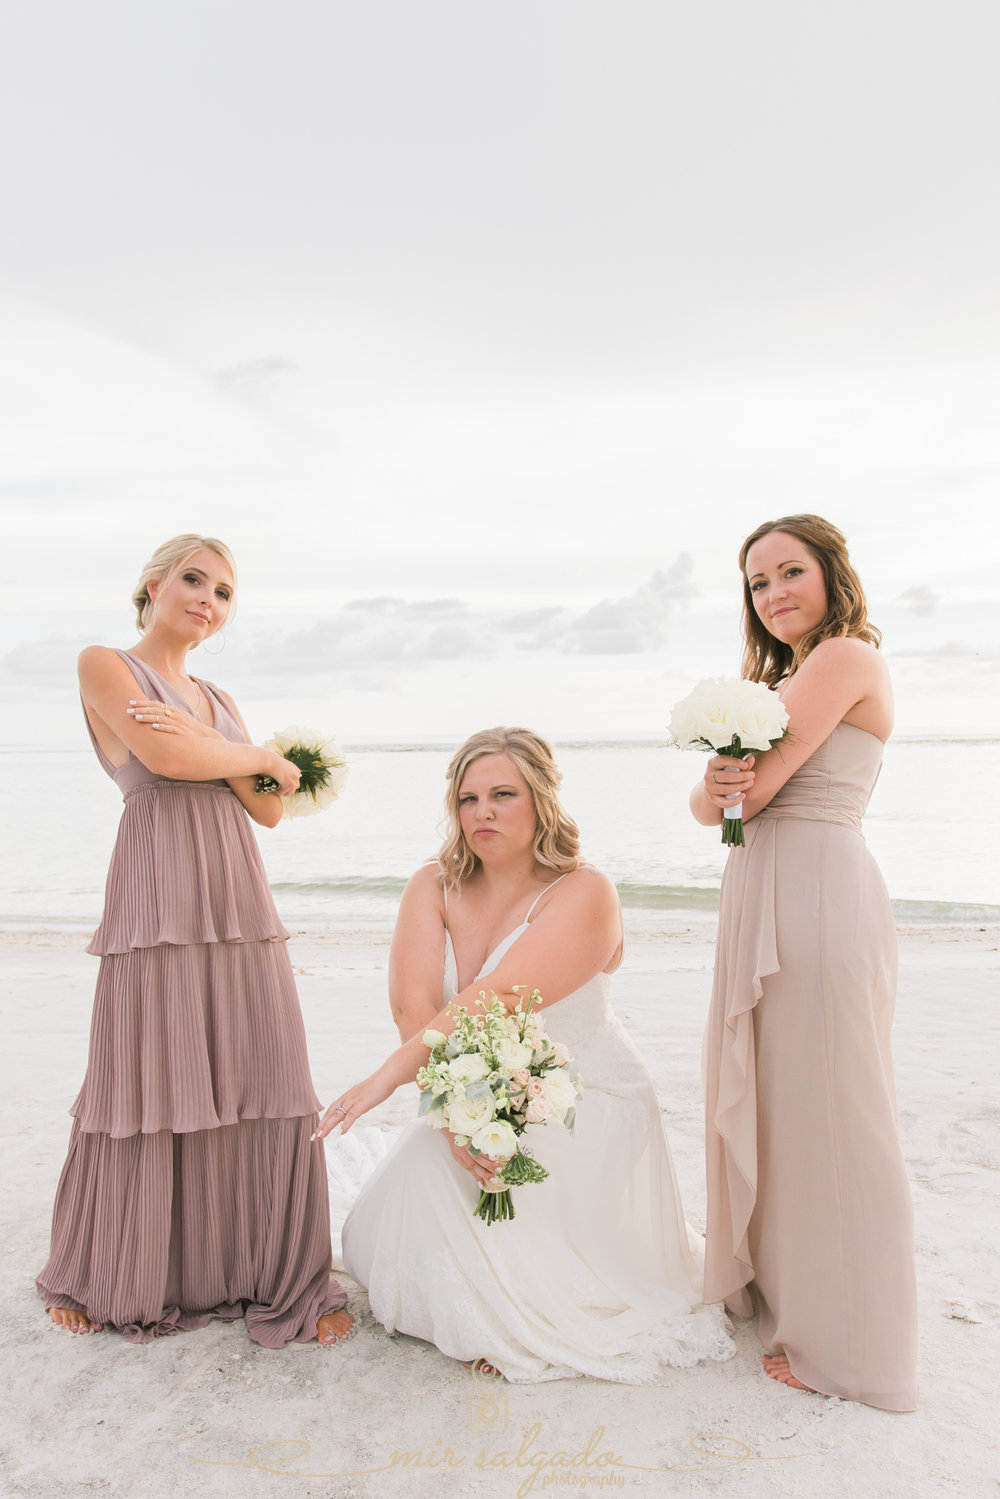 Beach-wedding-photographer, bride-and-bridesmaids-photo, St.Pete-wedding-photographer